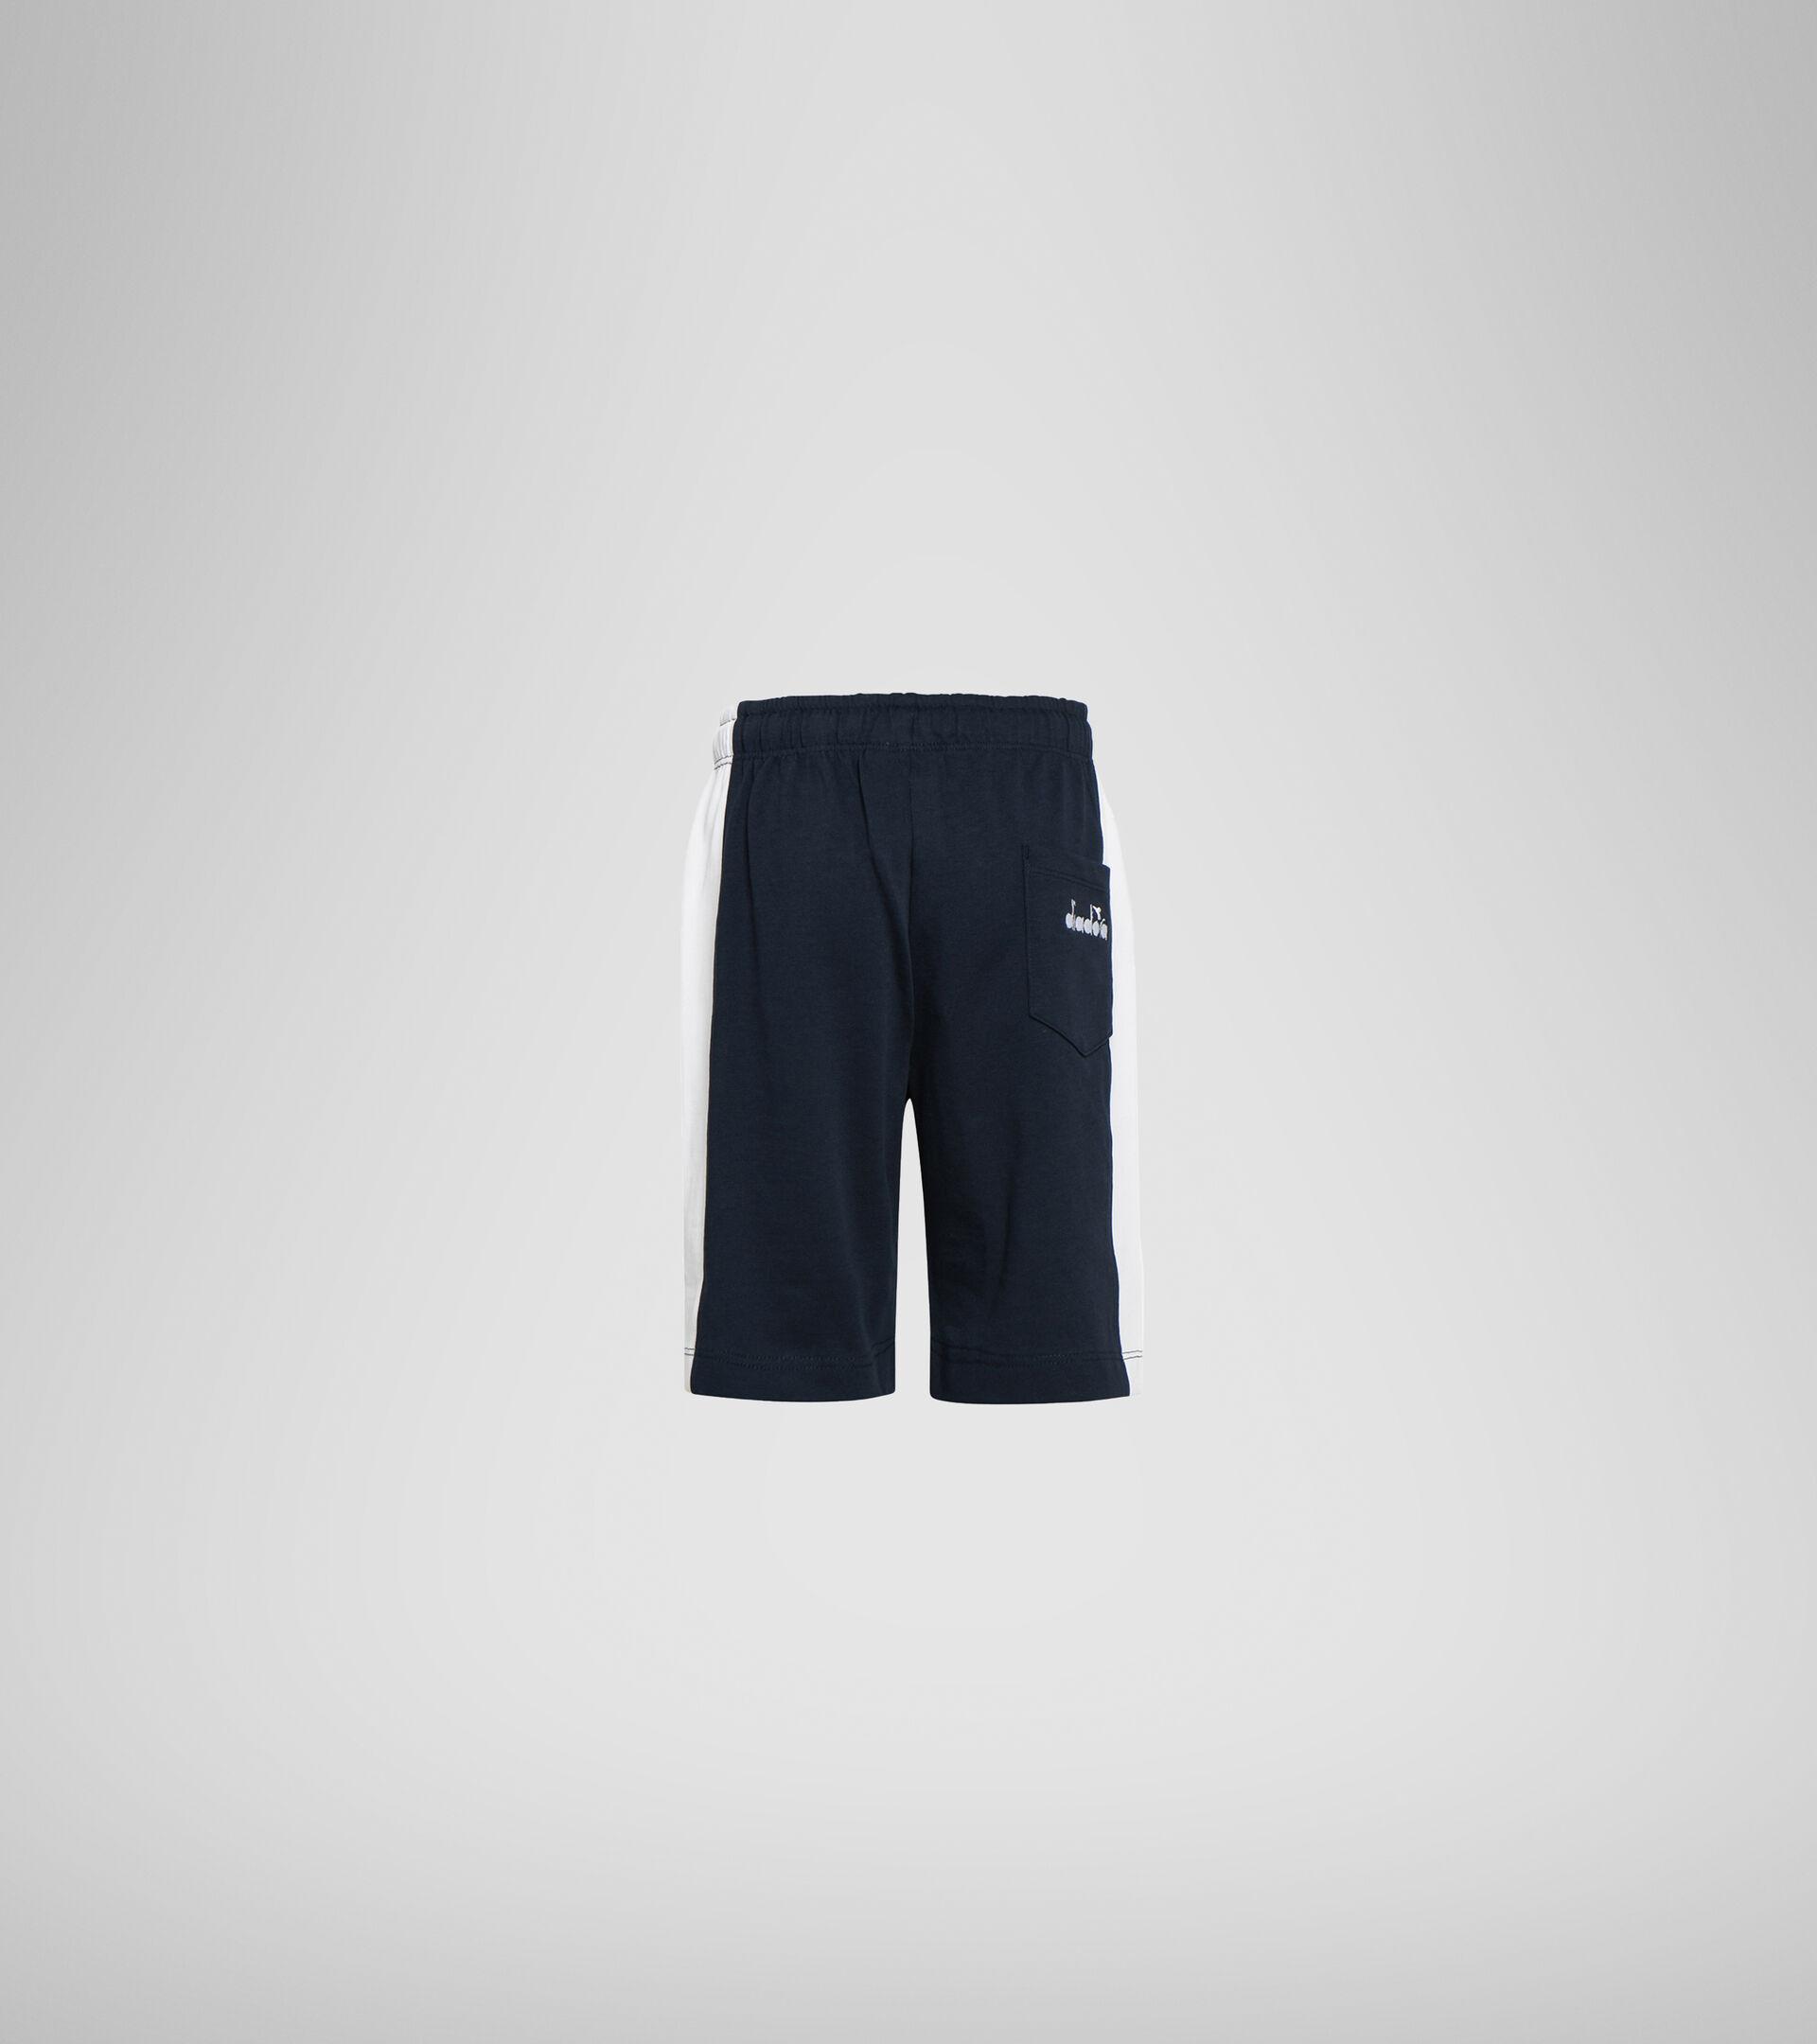 Bermuda shorts - Boys JB. BERMUDA DIADORA CLUB BLUE CORSAIR - Diadora